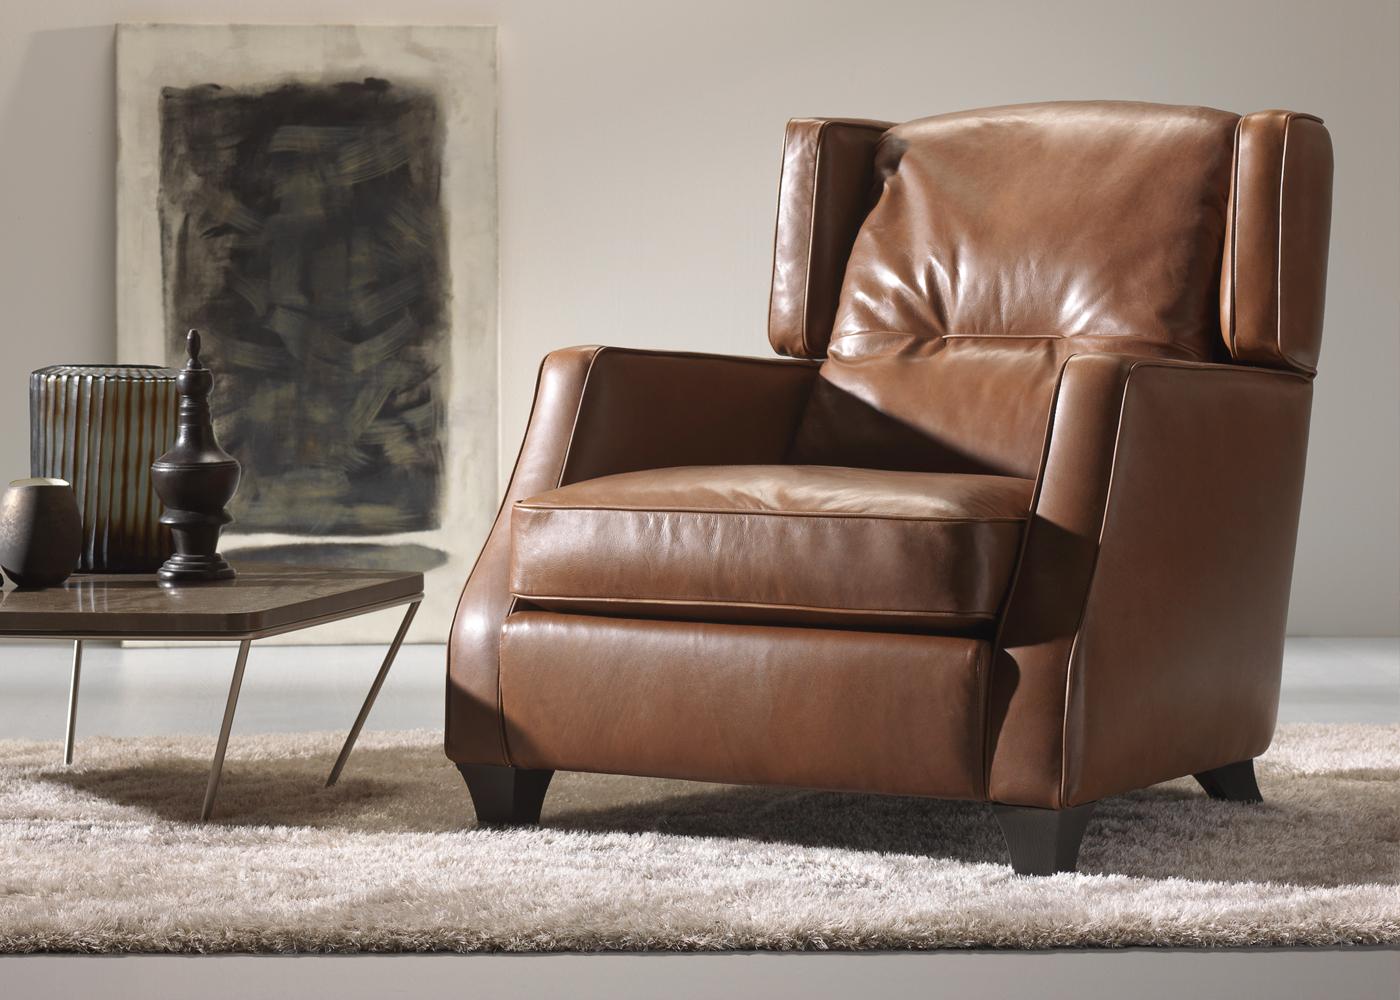 natuzzi lounge chair best executive chairs 2018 amadeus midfurn furniture superstore